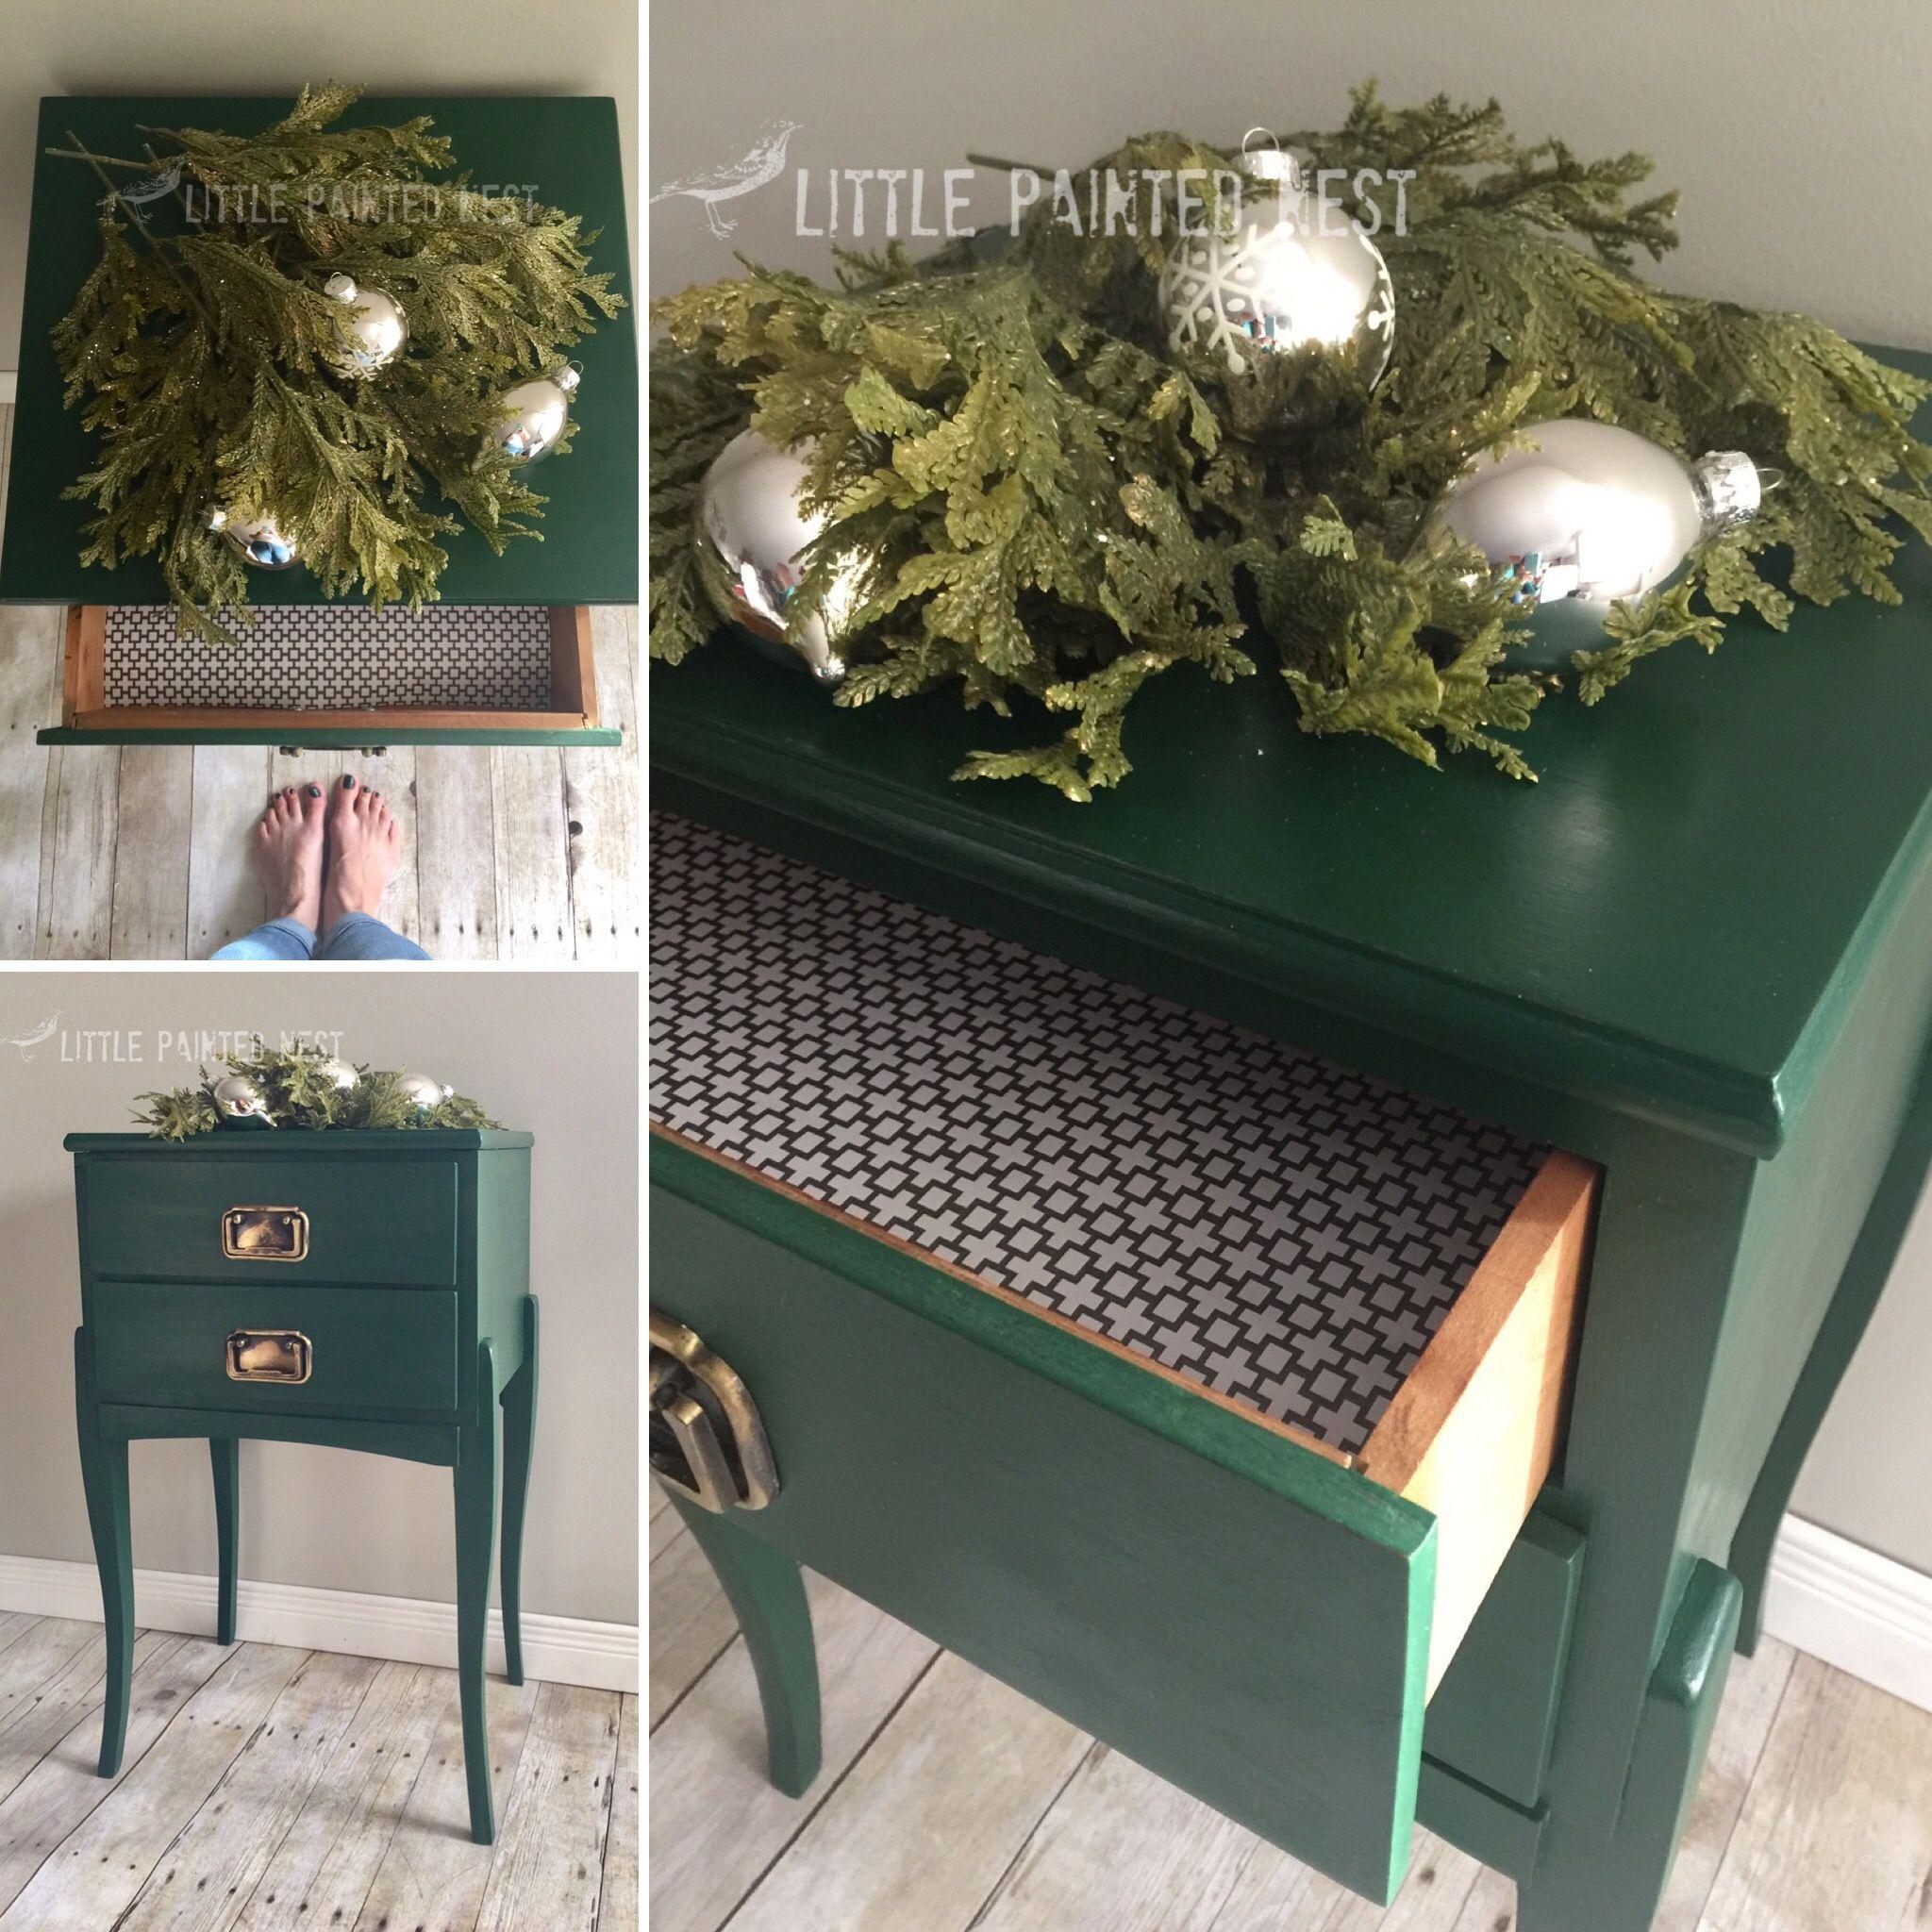 Annie Sloan Amsterdam green & clear wax! Sleek & sophisticated!